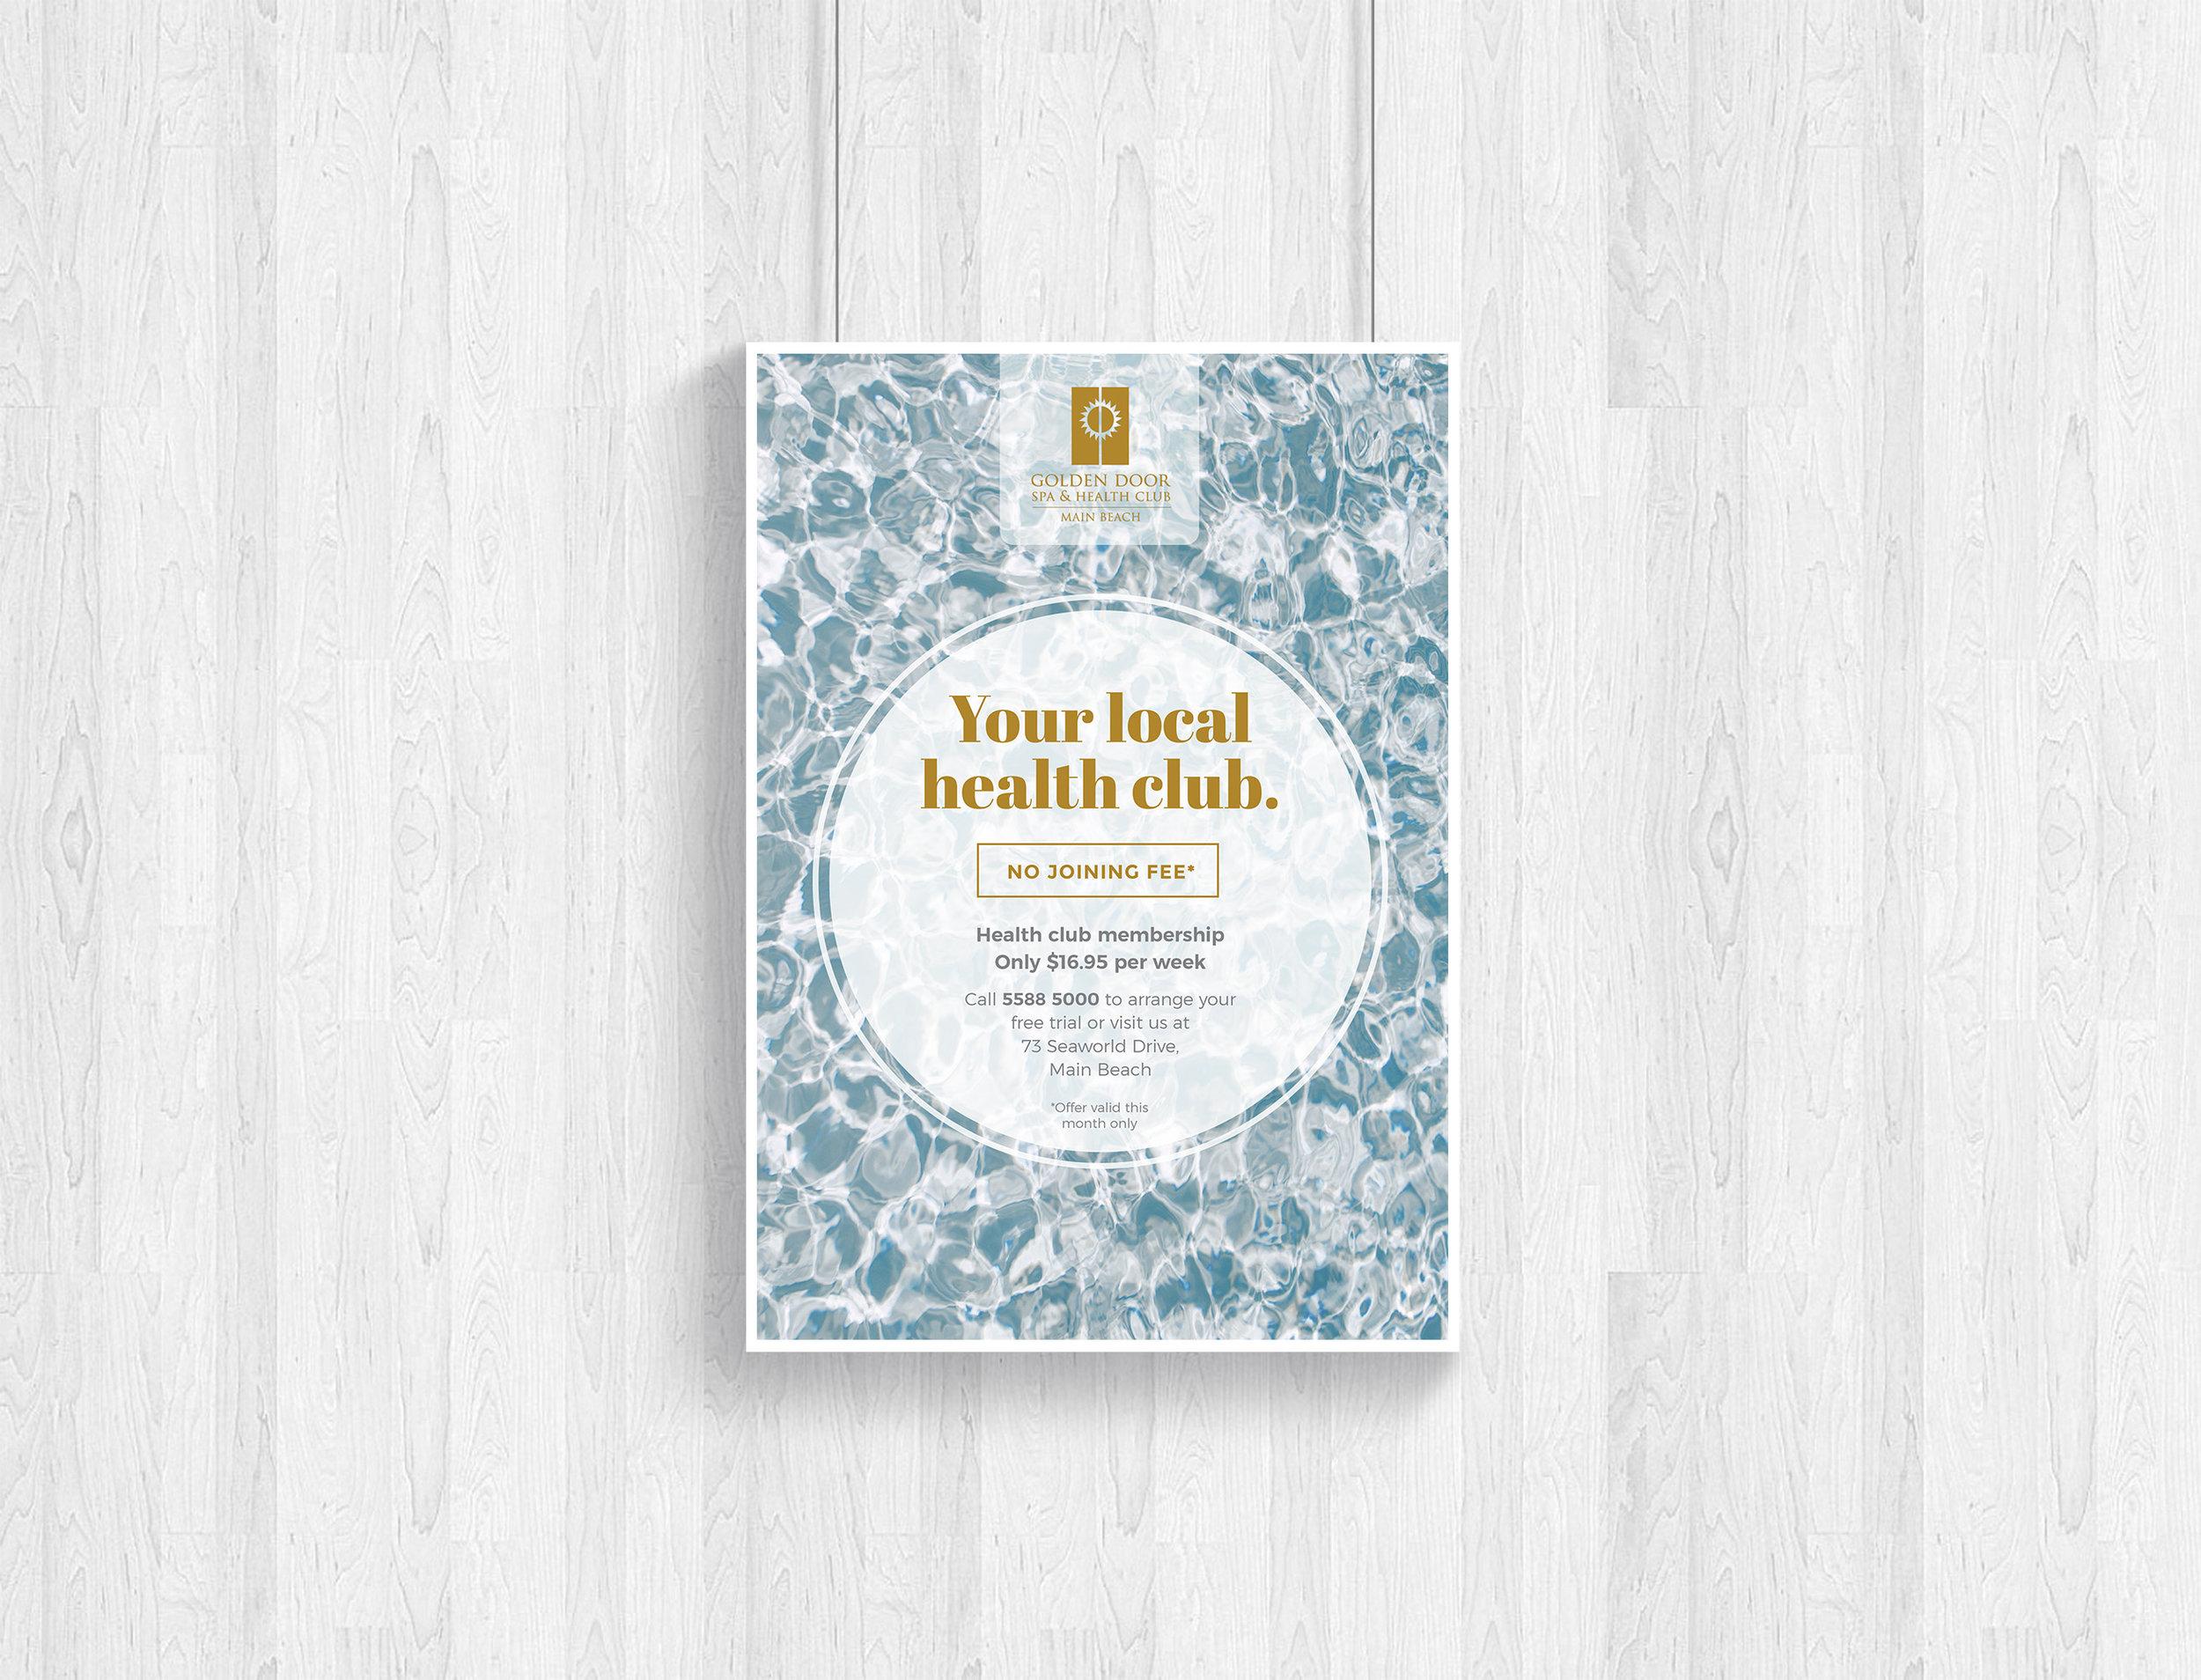 Health Club Poster MockUp-wood.jpg